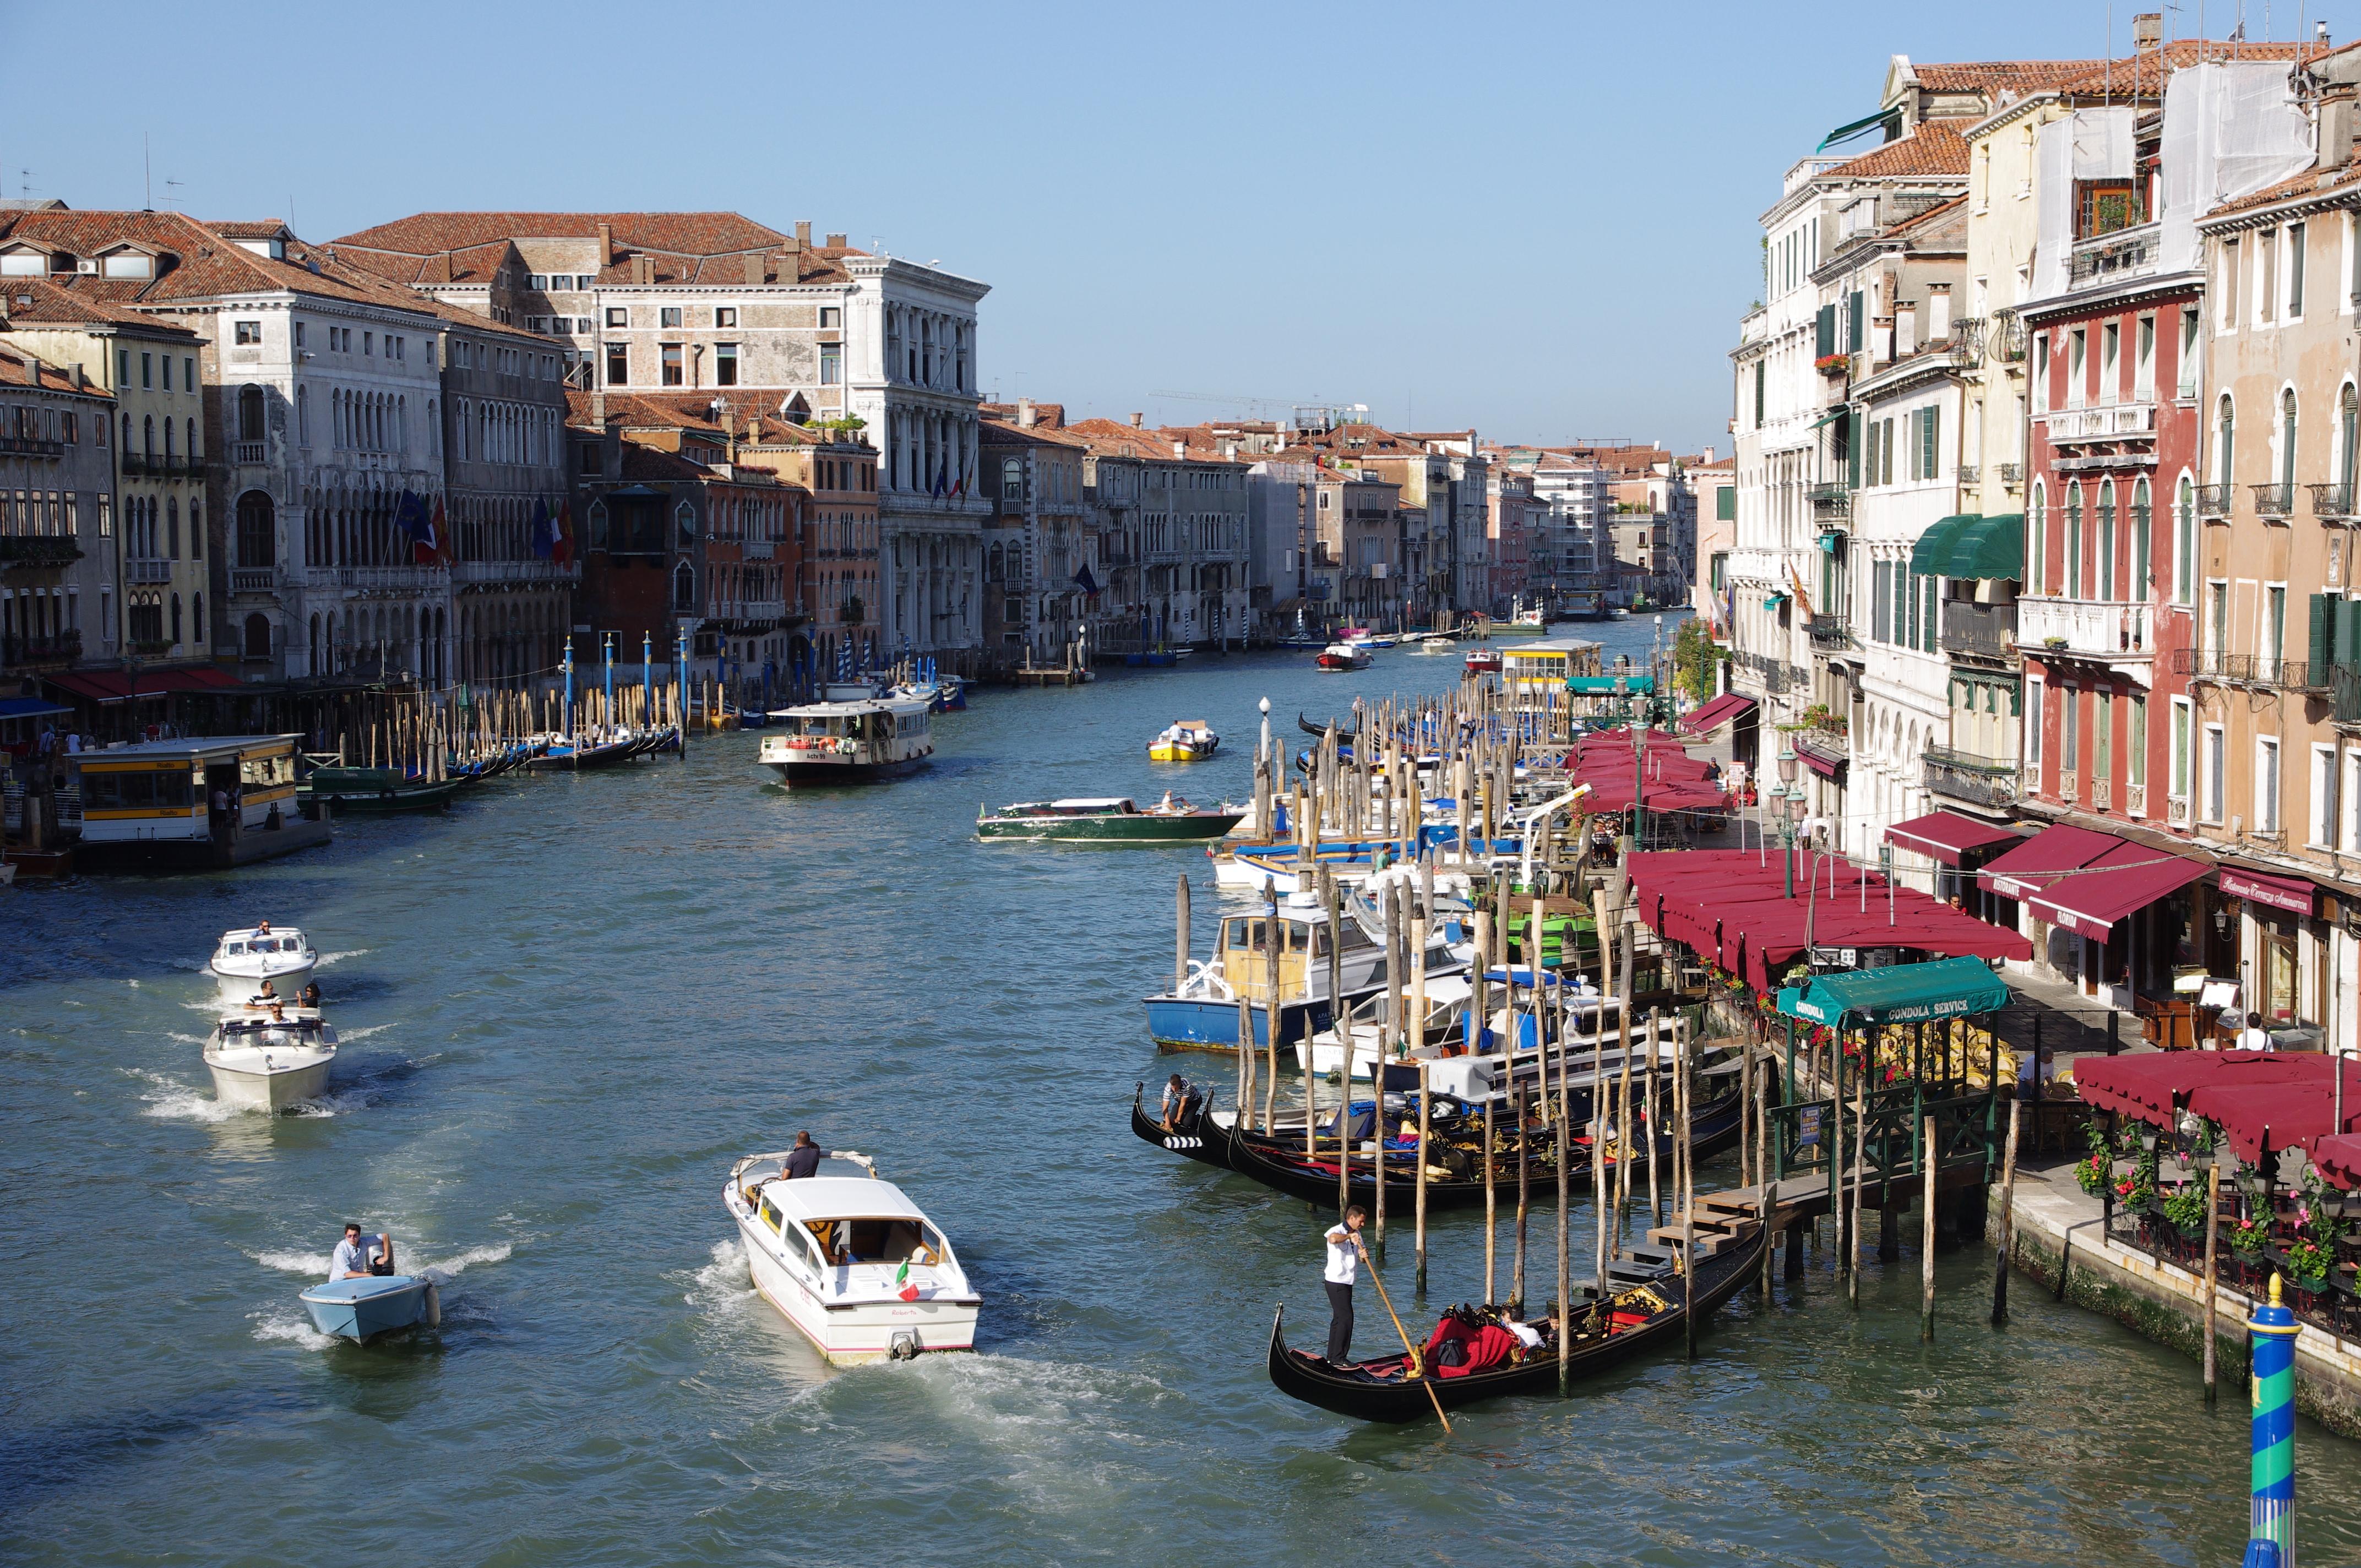 File:20110722 Venice Canal Grande 4072.jpg - Wikimedia Commons